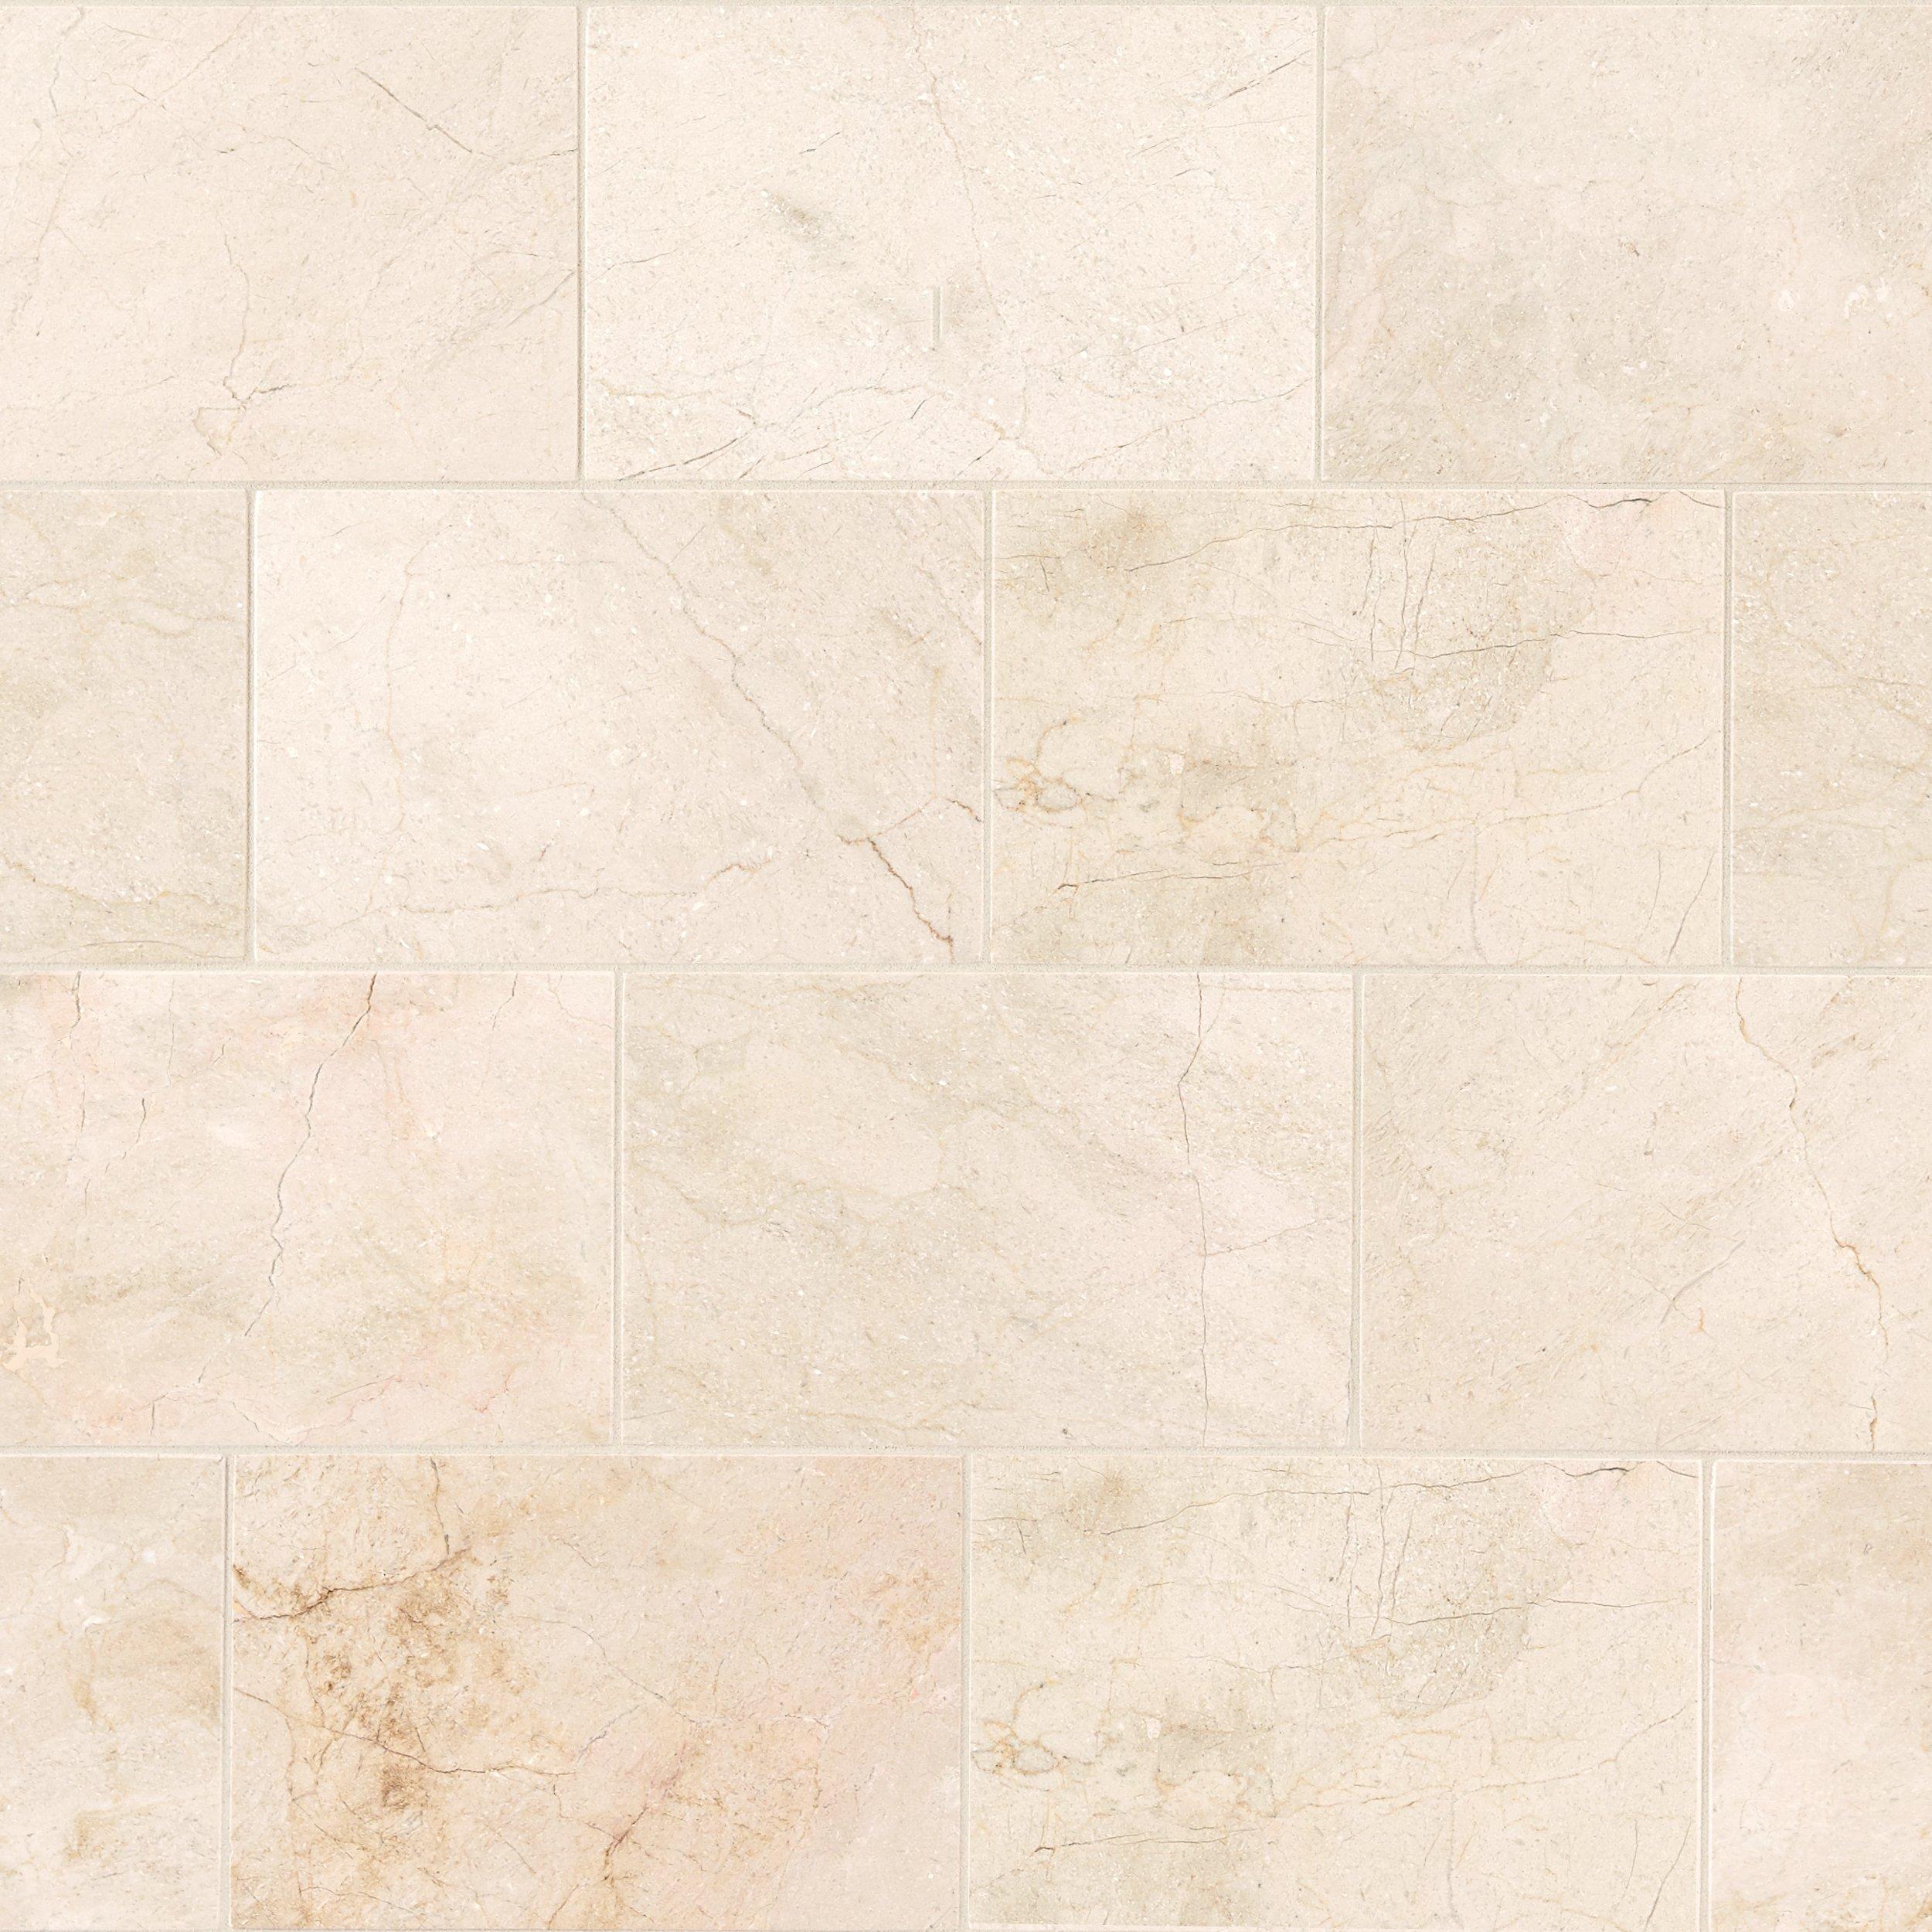 avillano crema marfil polished marble tile